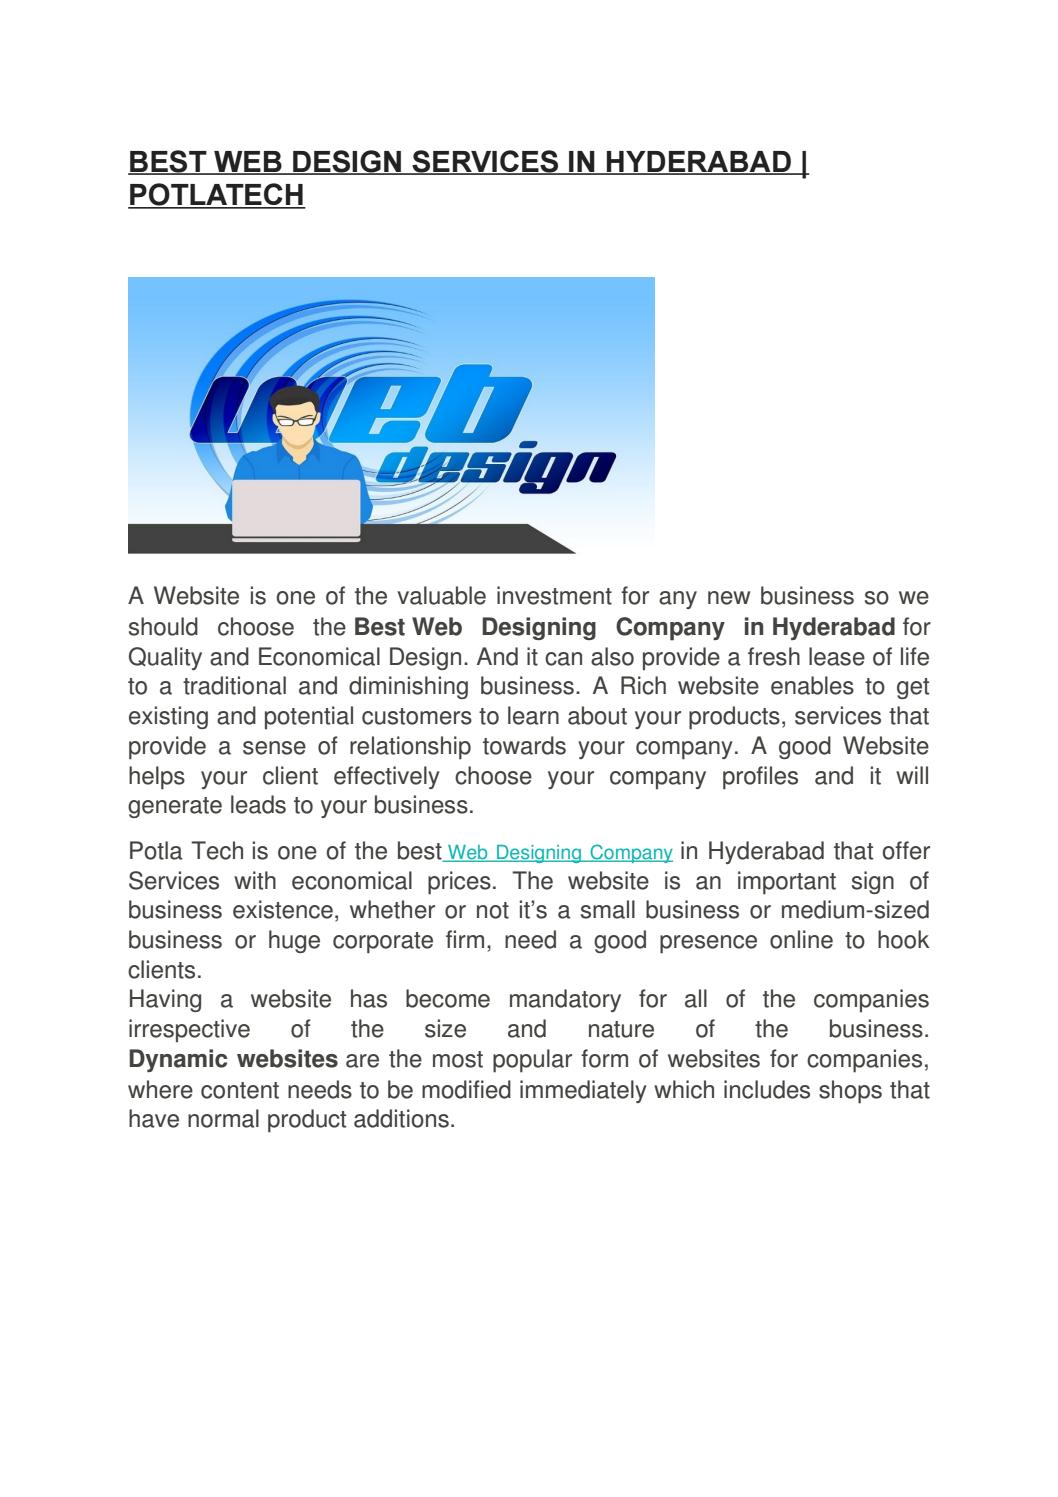 Best Web Design Services In Hyderabad Potlatech By Potla Tech Issuu